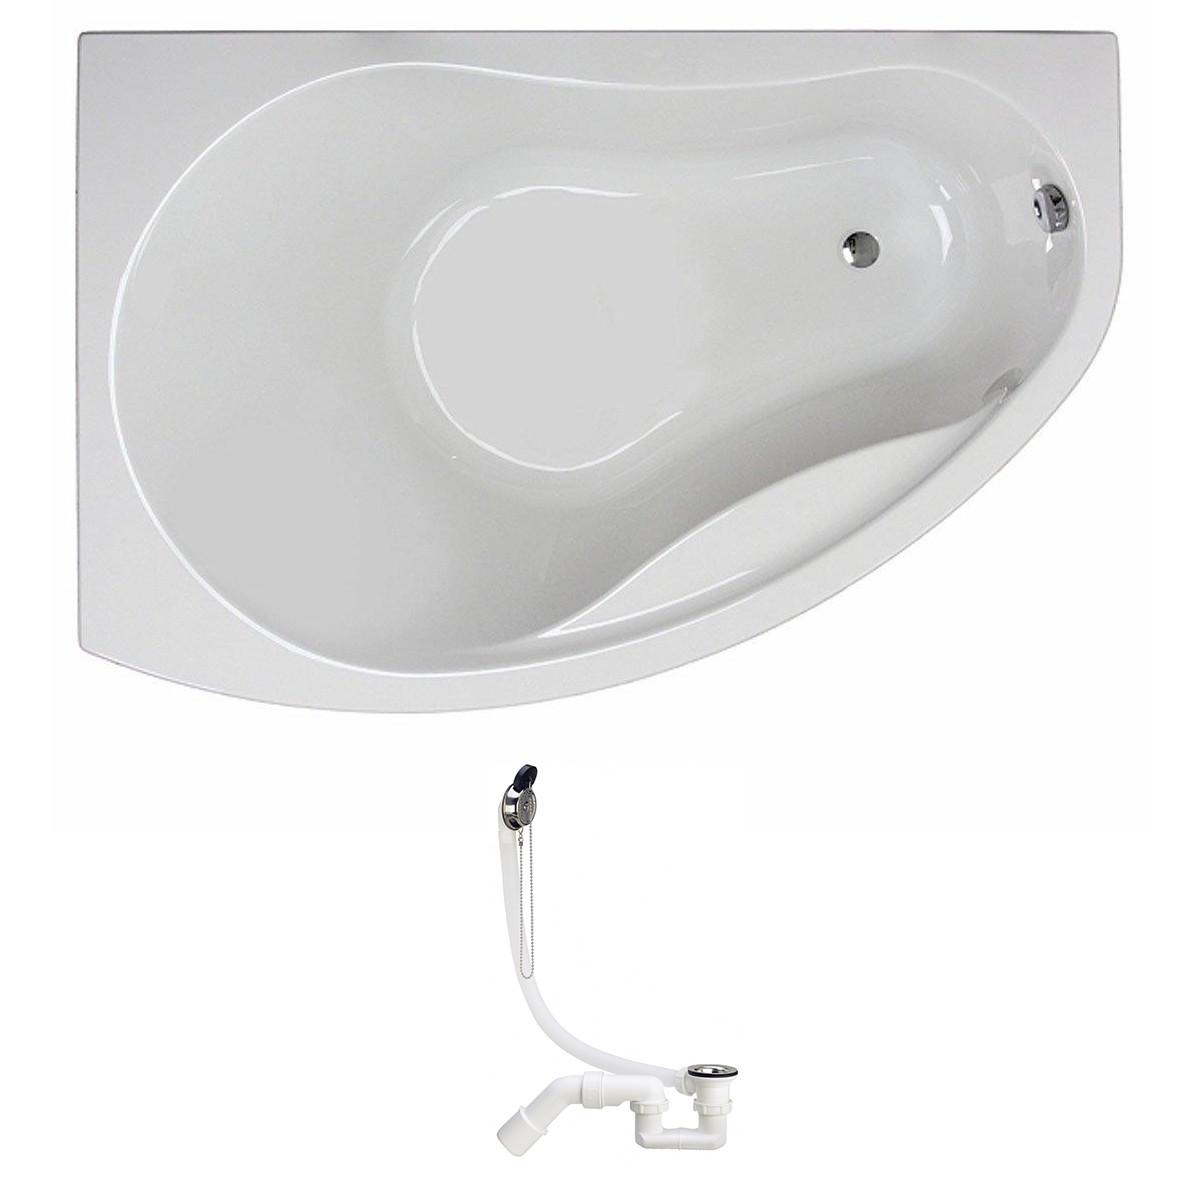 PROMISE ванна 150*100см асимметричная, левая, белая, с ножками SN7 + Viega Simplex сифон для ванны